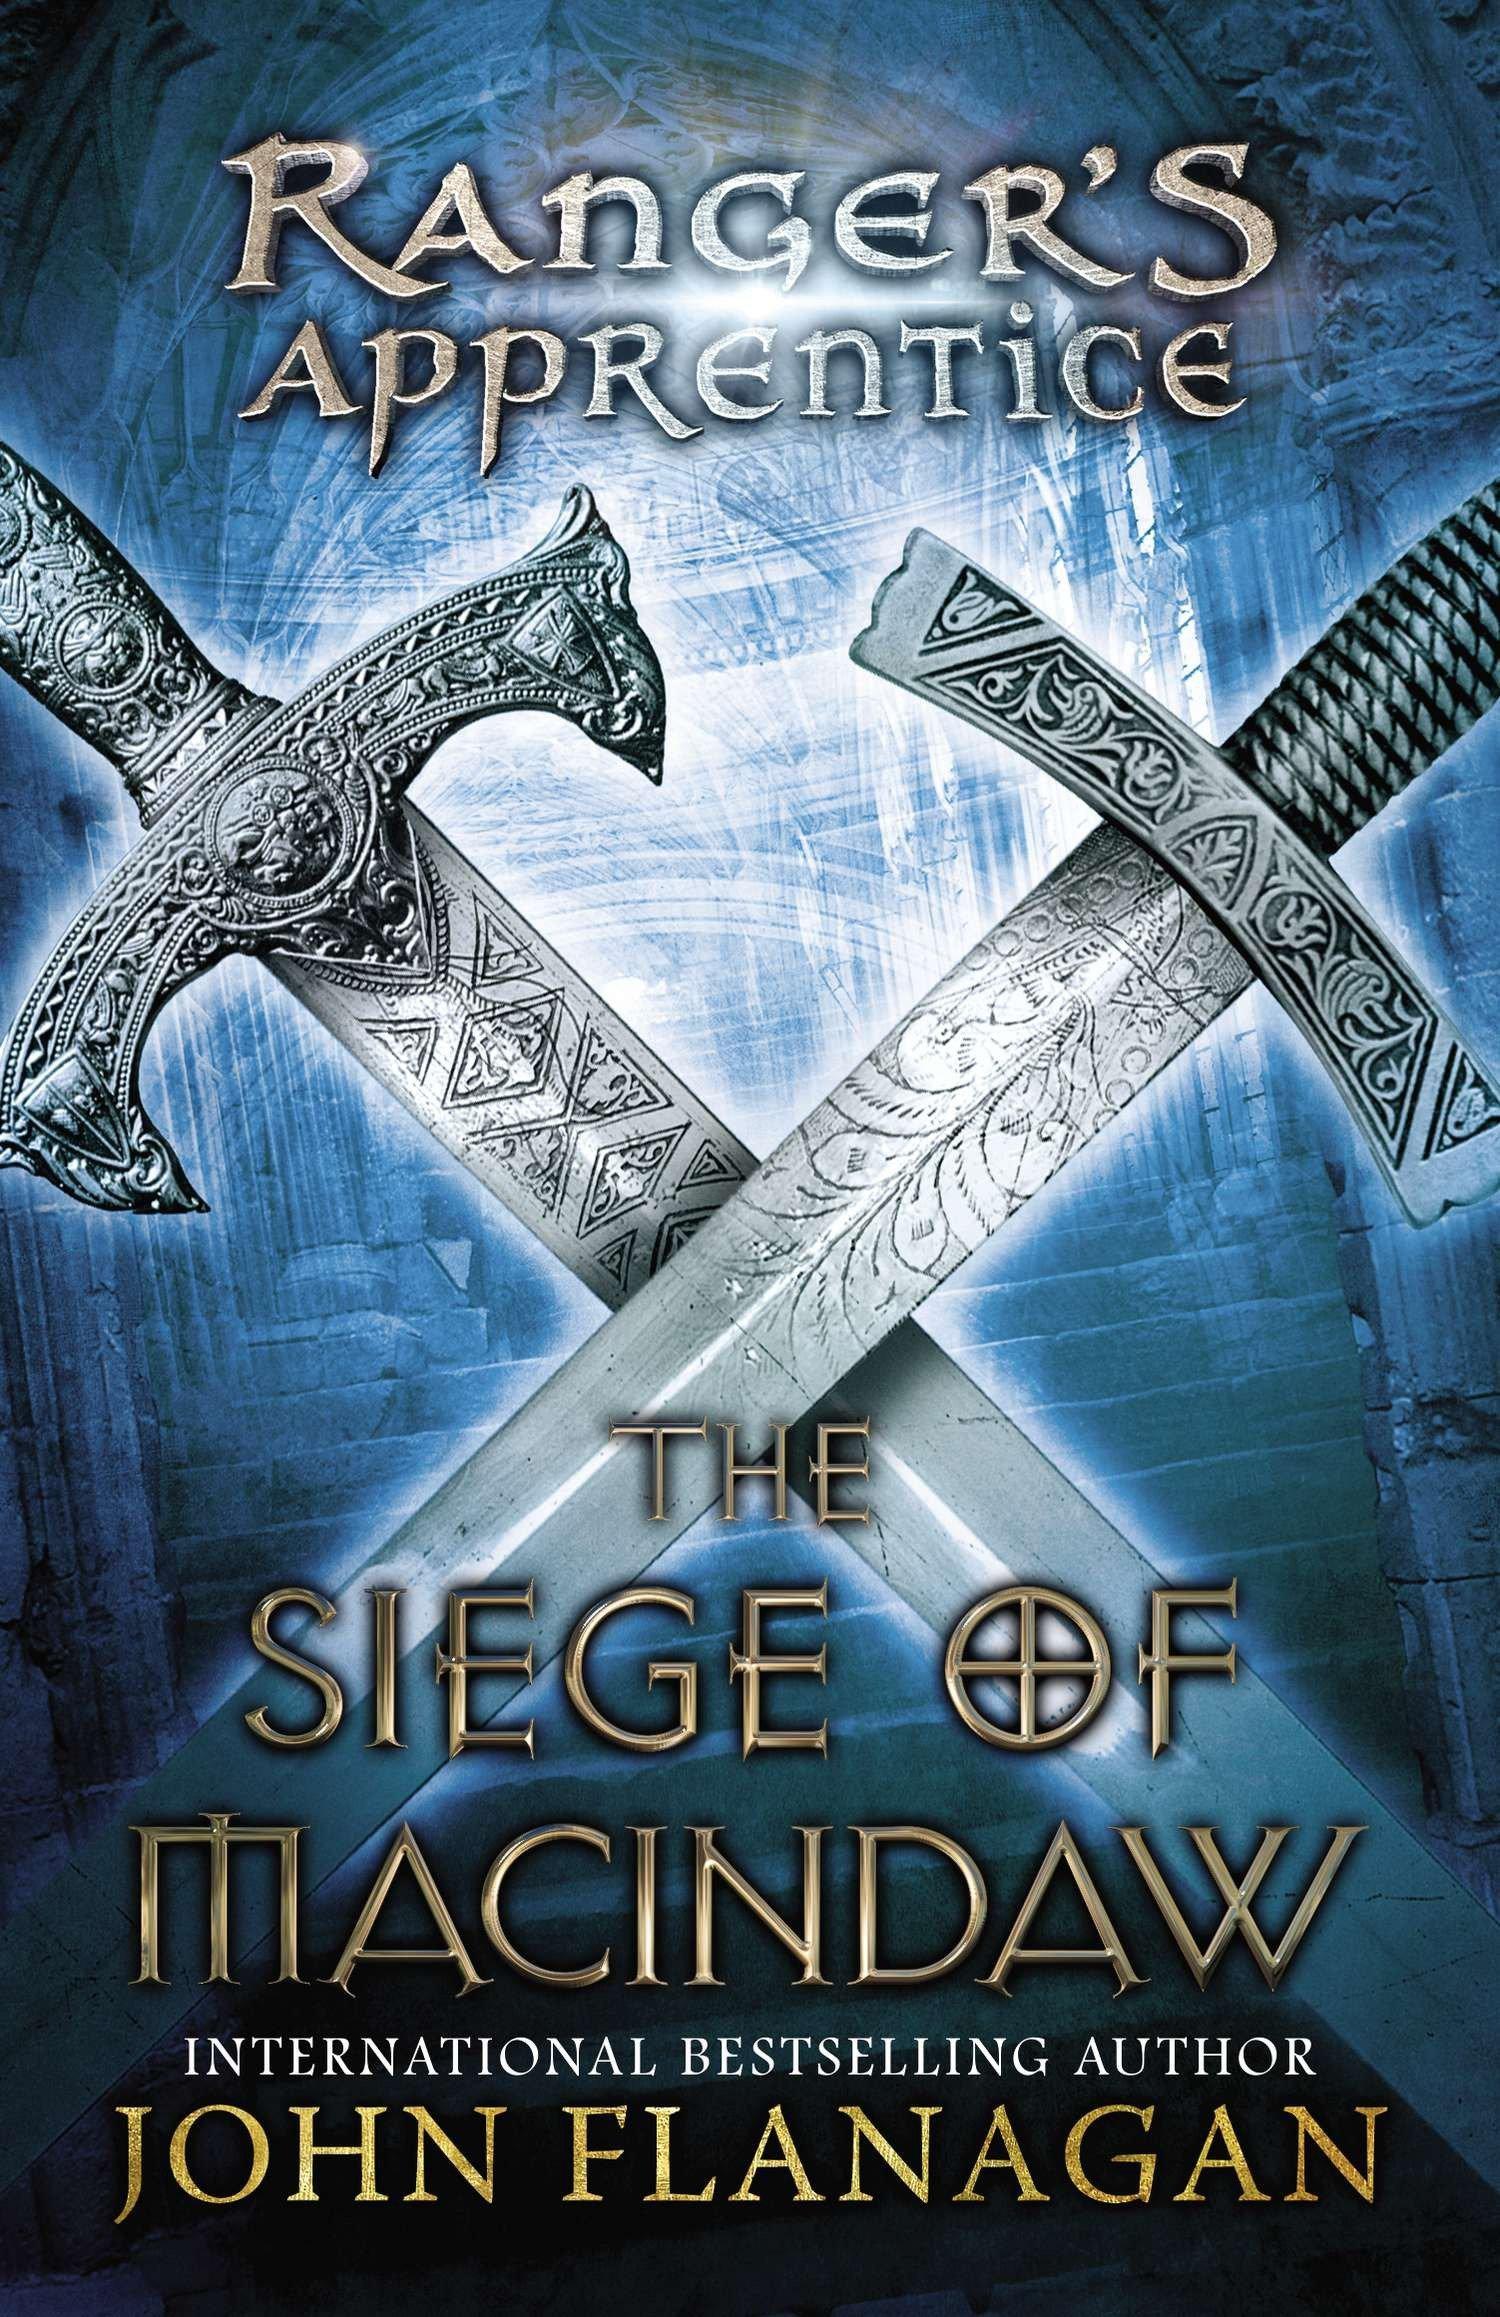 Ranger's Apprentice: The Siege of Macindaw - John Flanagan